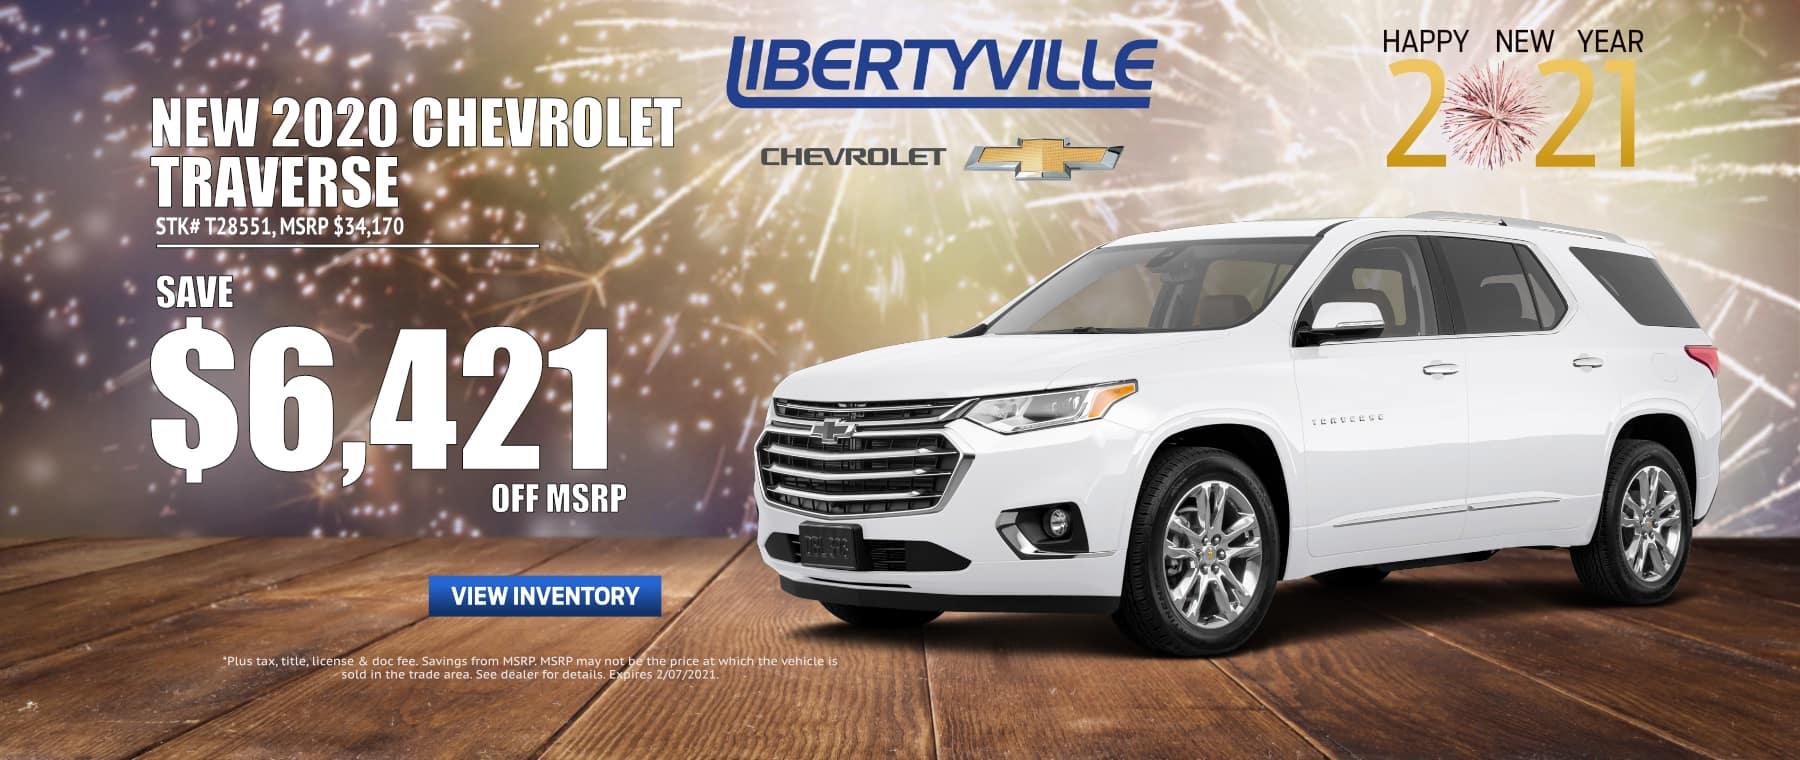 January-2021_Traverse_Sale__Libertyville